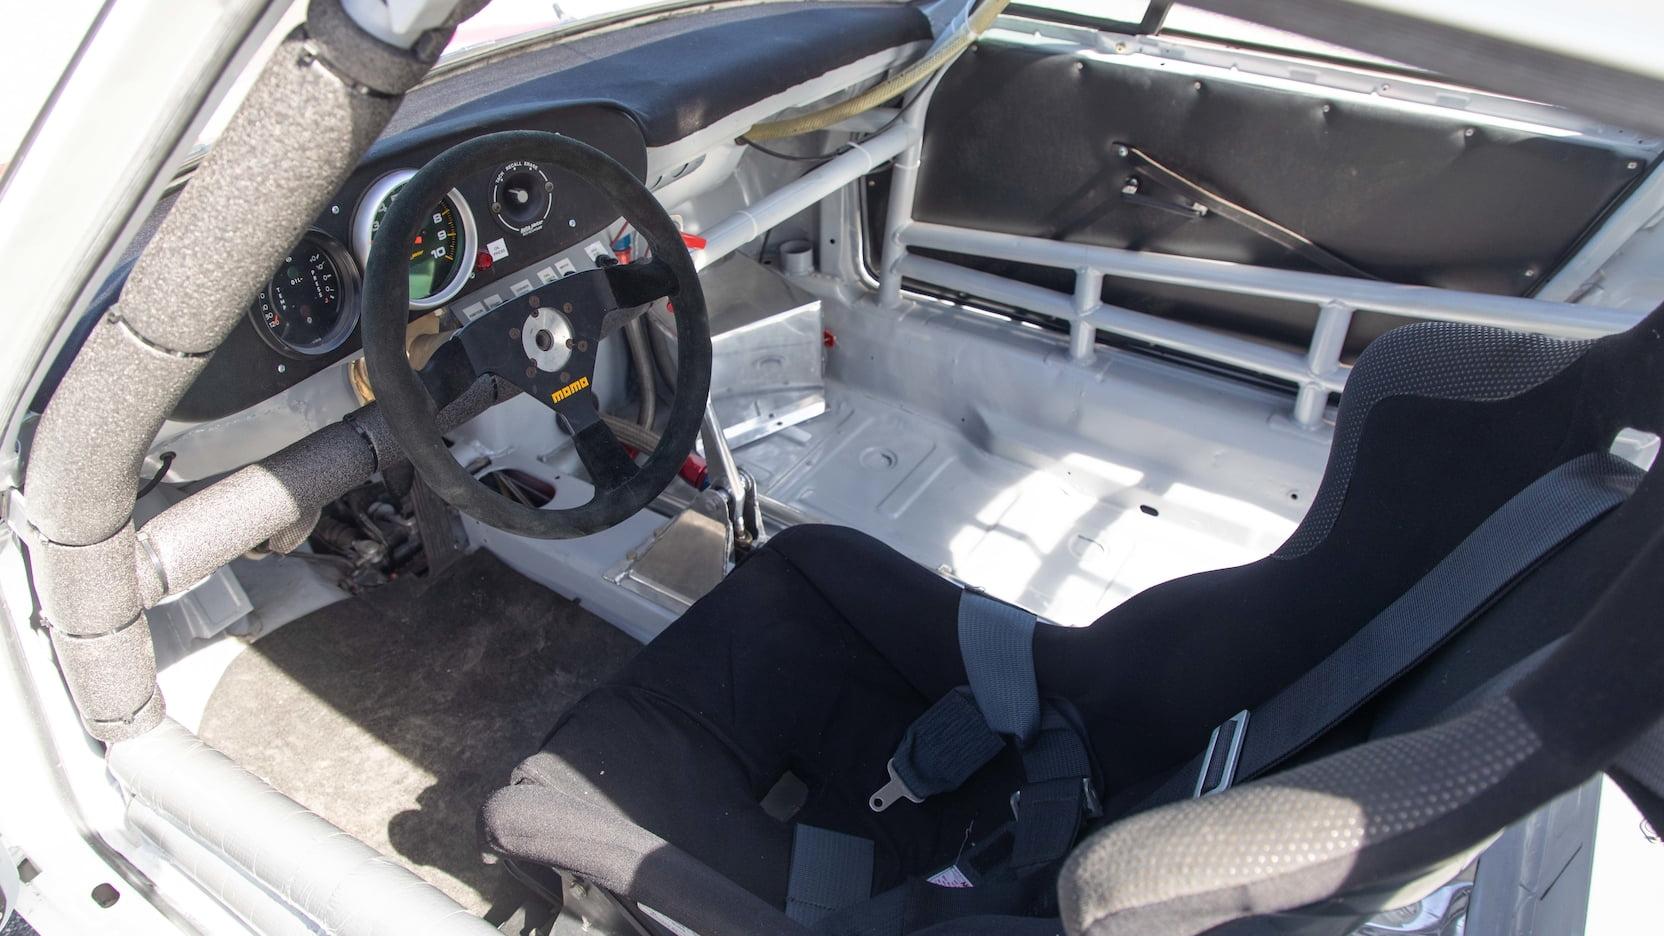 Paul Newman's 1974 Porsche 911S interior